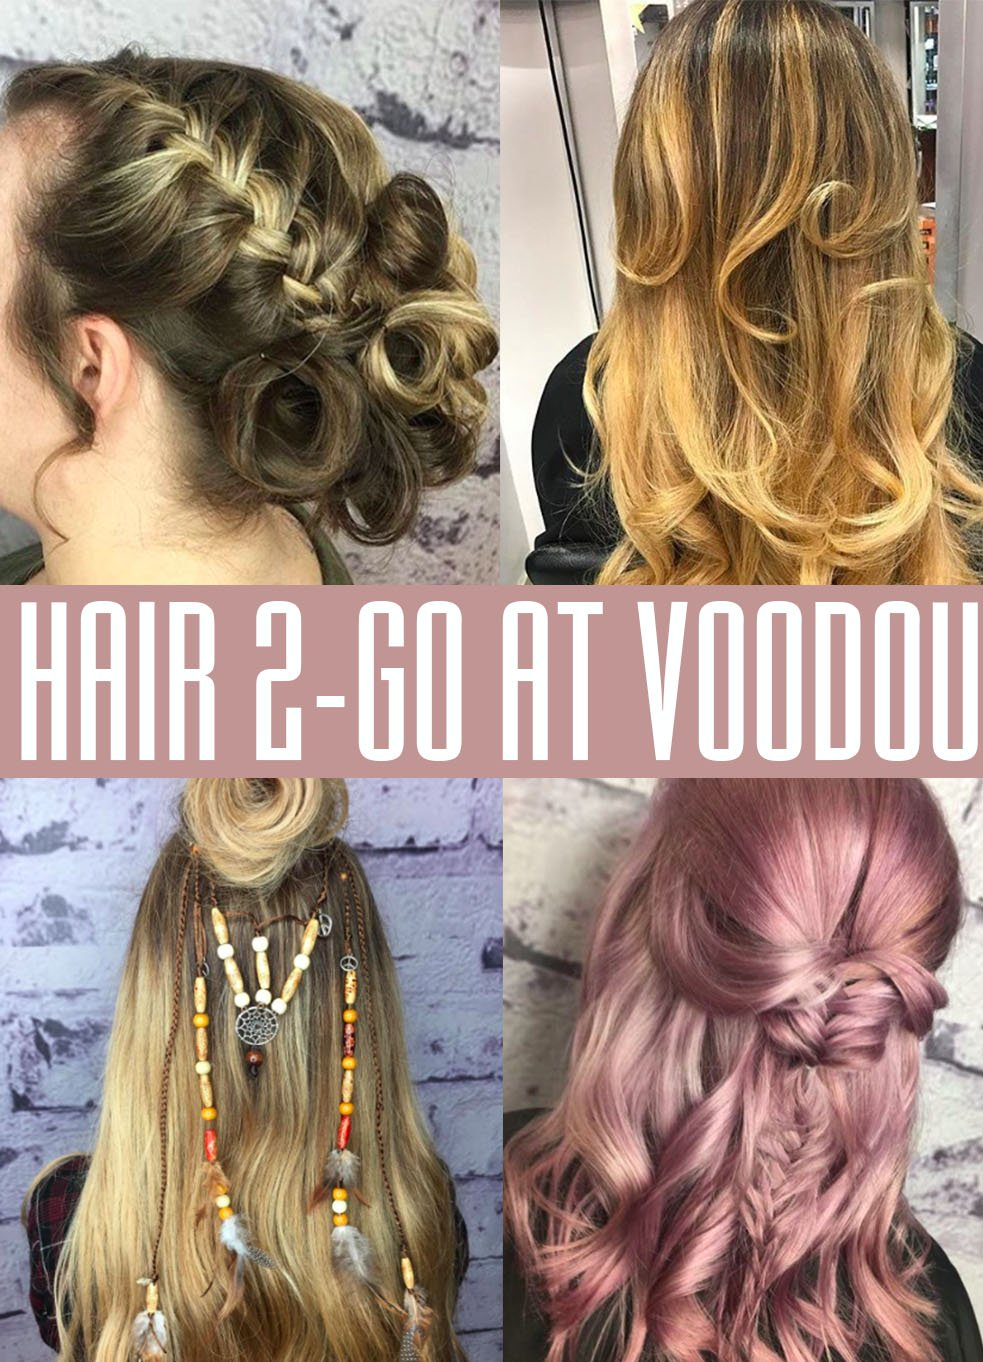 Hair 2-Go at Voodou